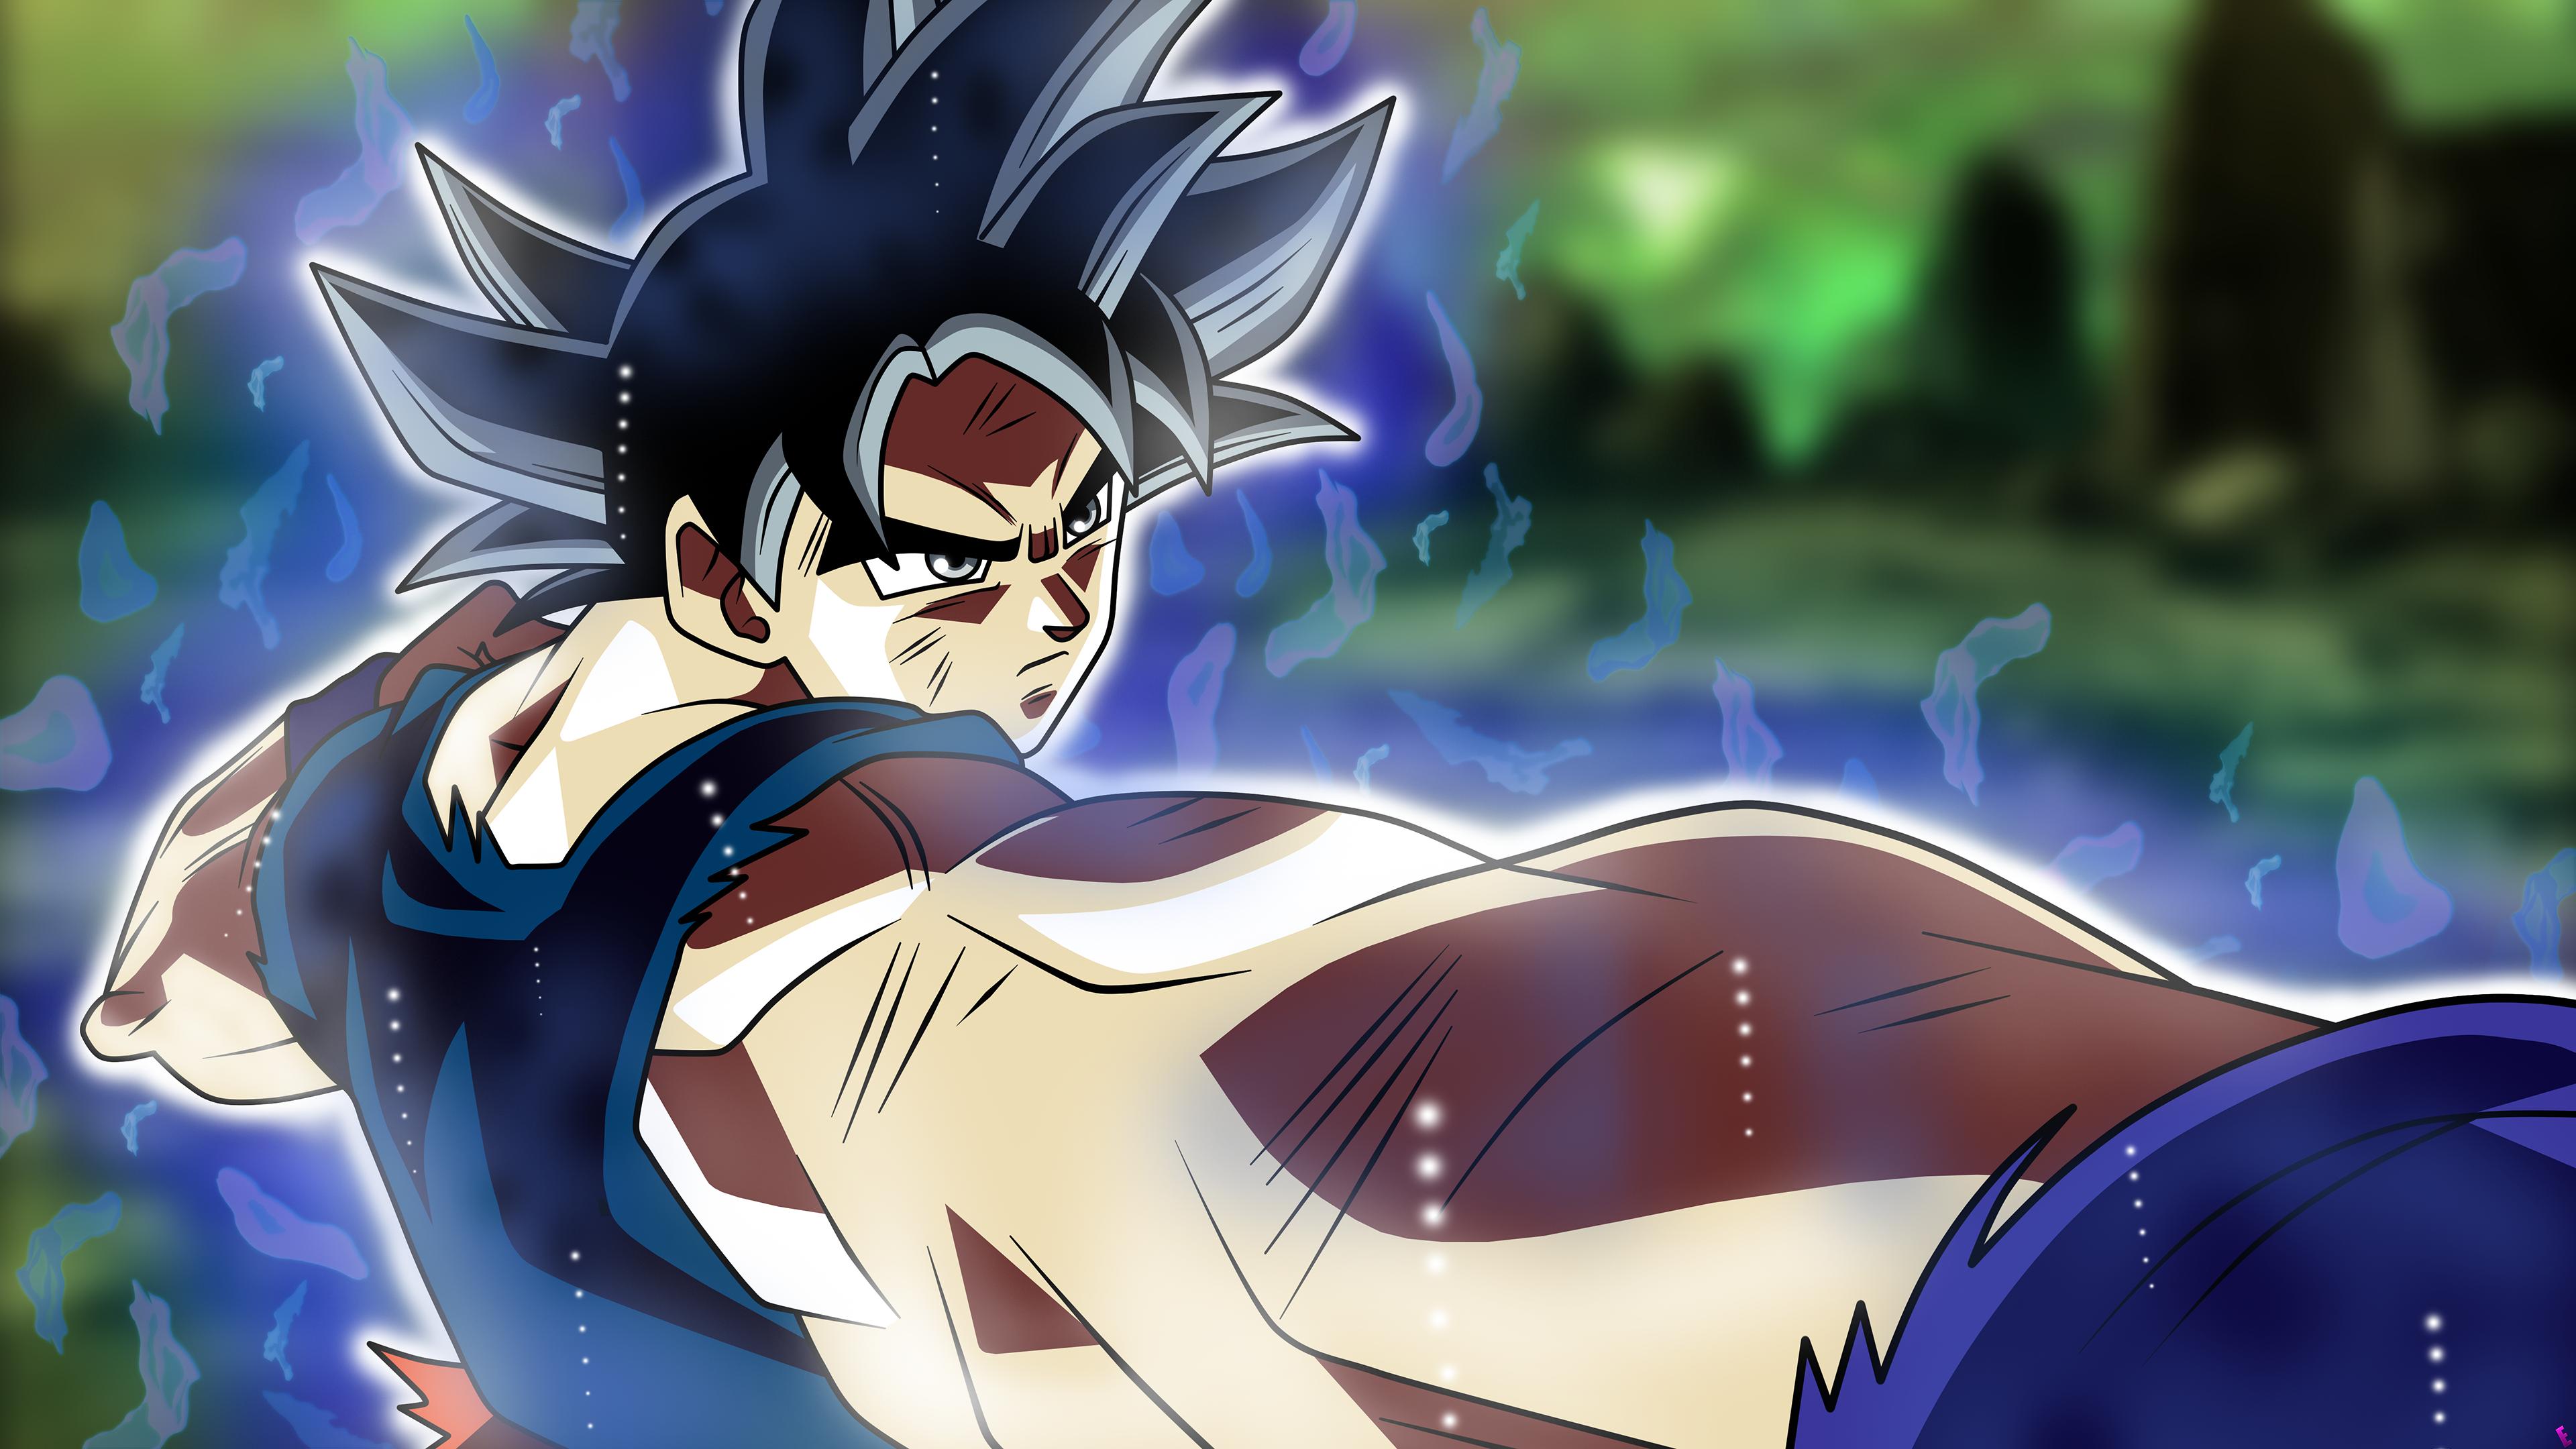 Goku Migatte No Gokui 4k Ultra Fond Décran Hd Arrière Plan